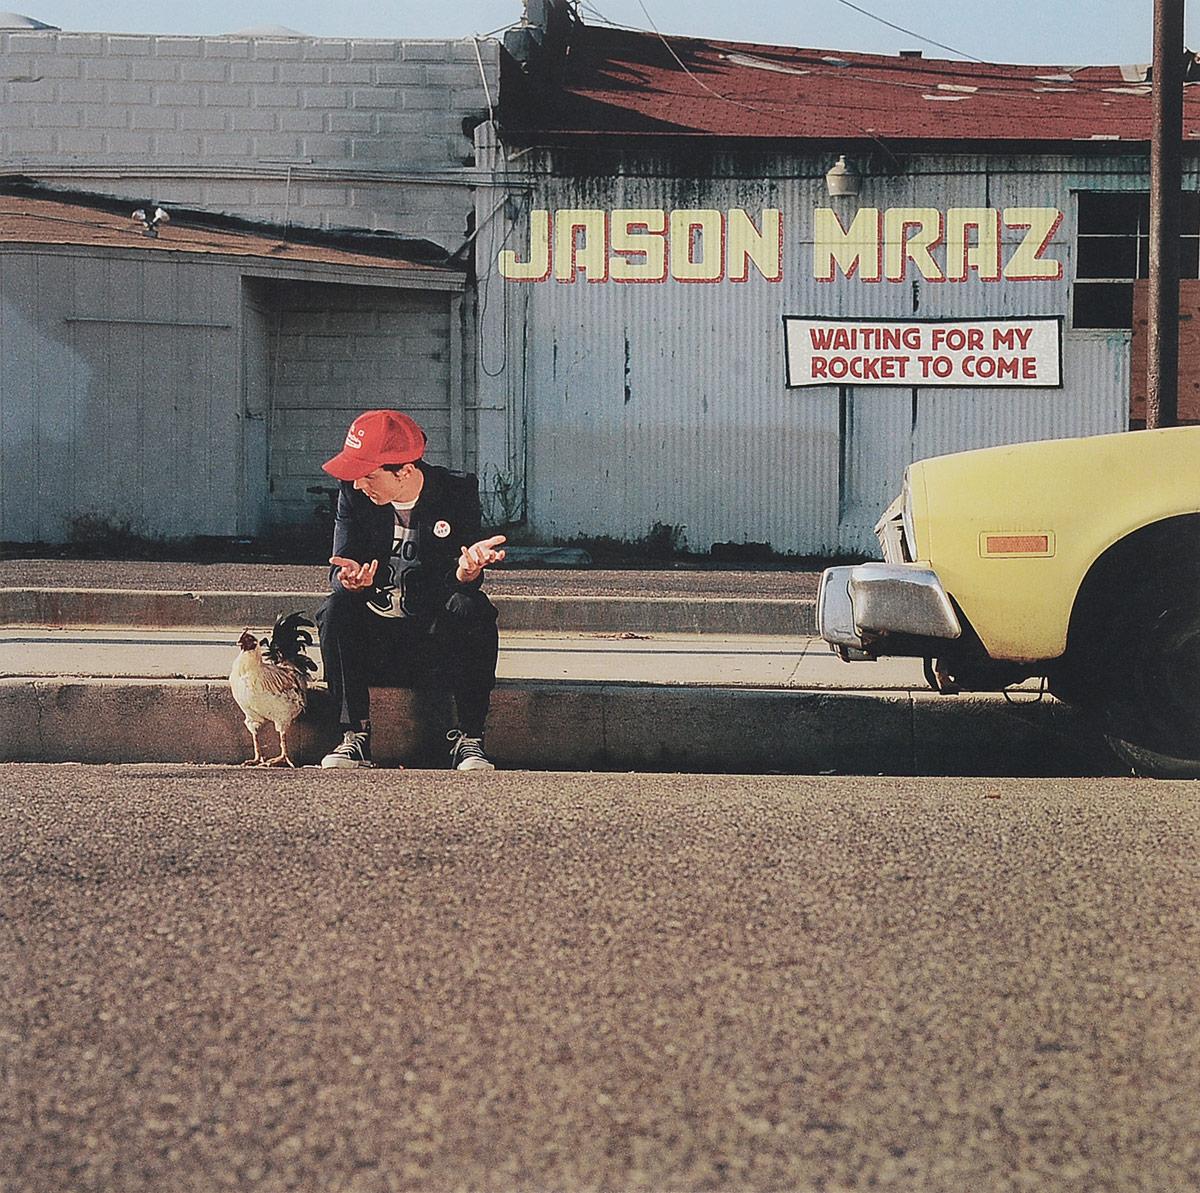 Джейсон Мрэз Jason Mraz. Waiting For My Rocket To Come (15th Anniversary) (2 LP) air air the virgin suicides 15th anniversary 3 lp 2 cd